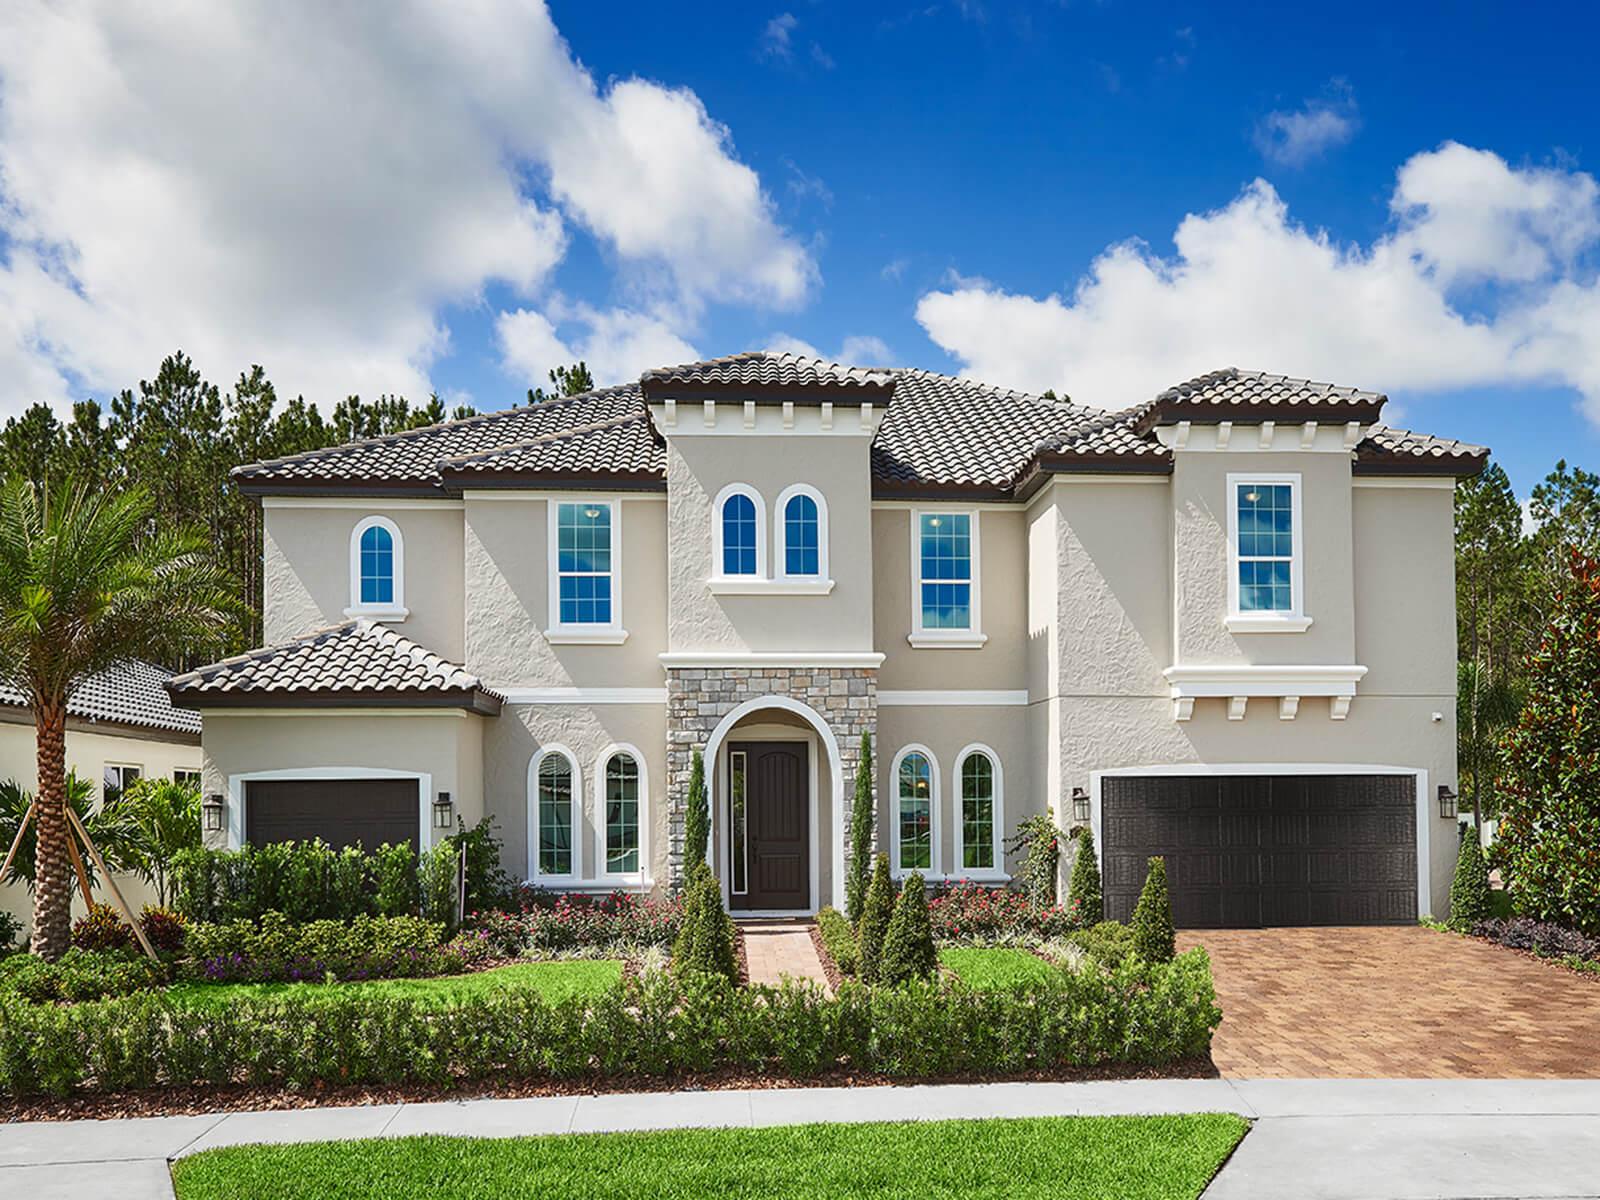 Orlando casas para alugar